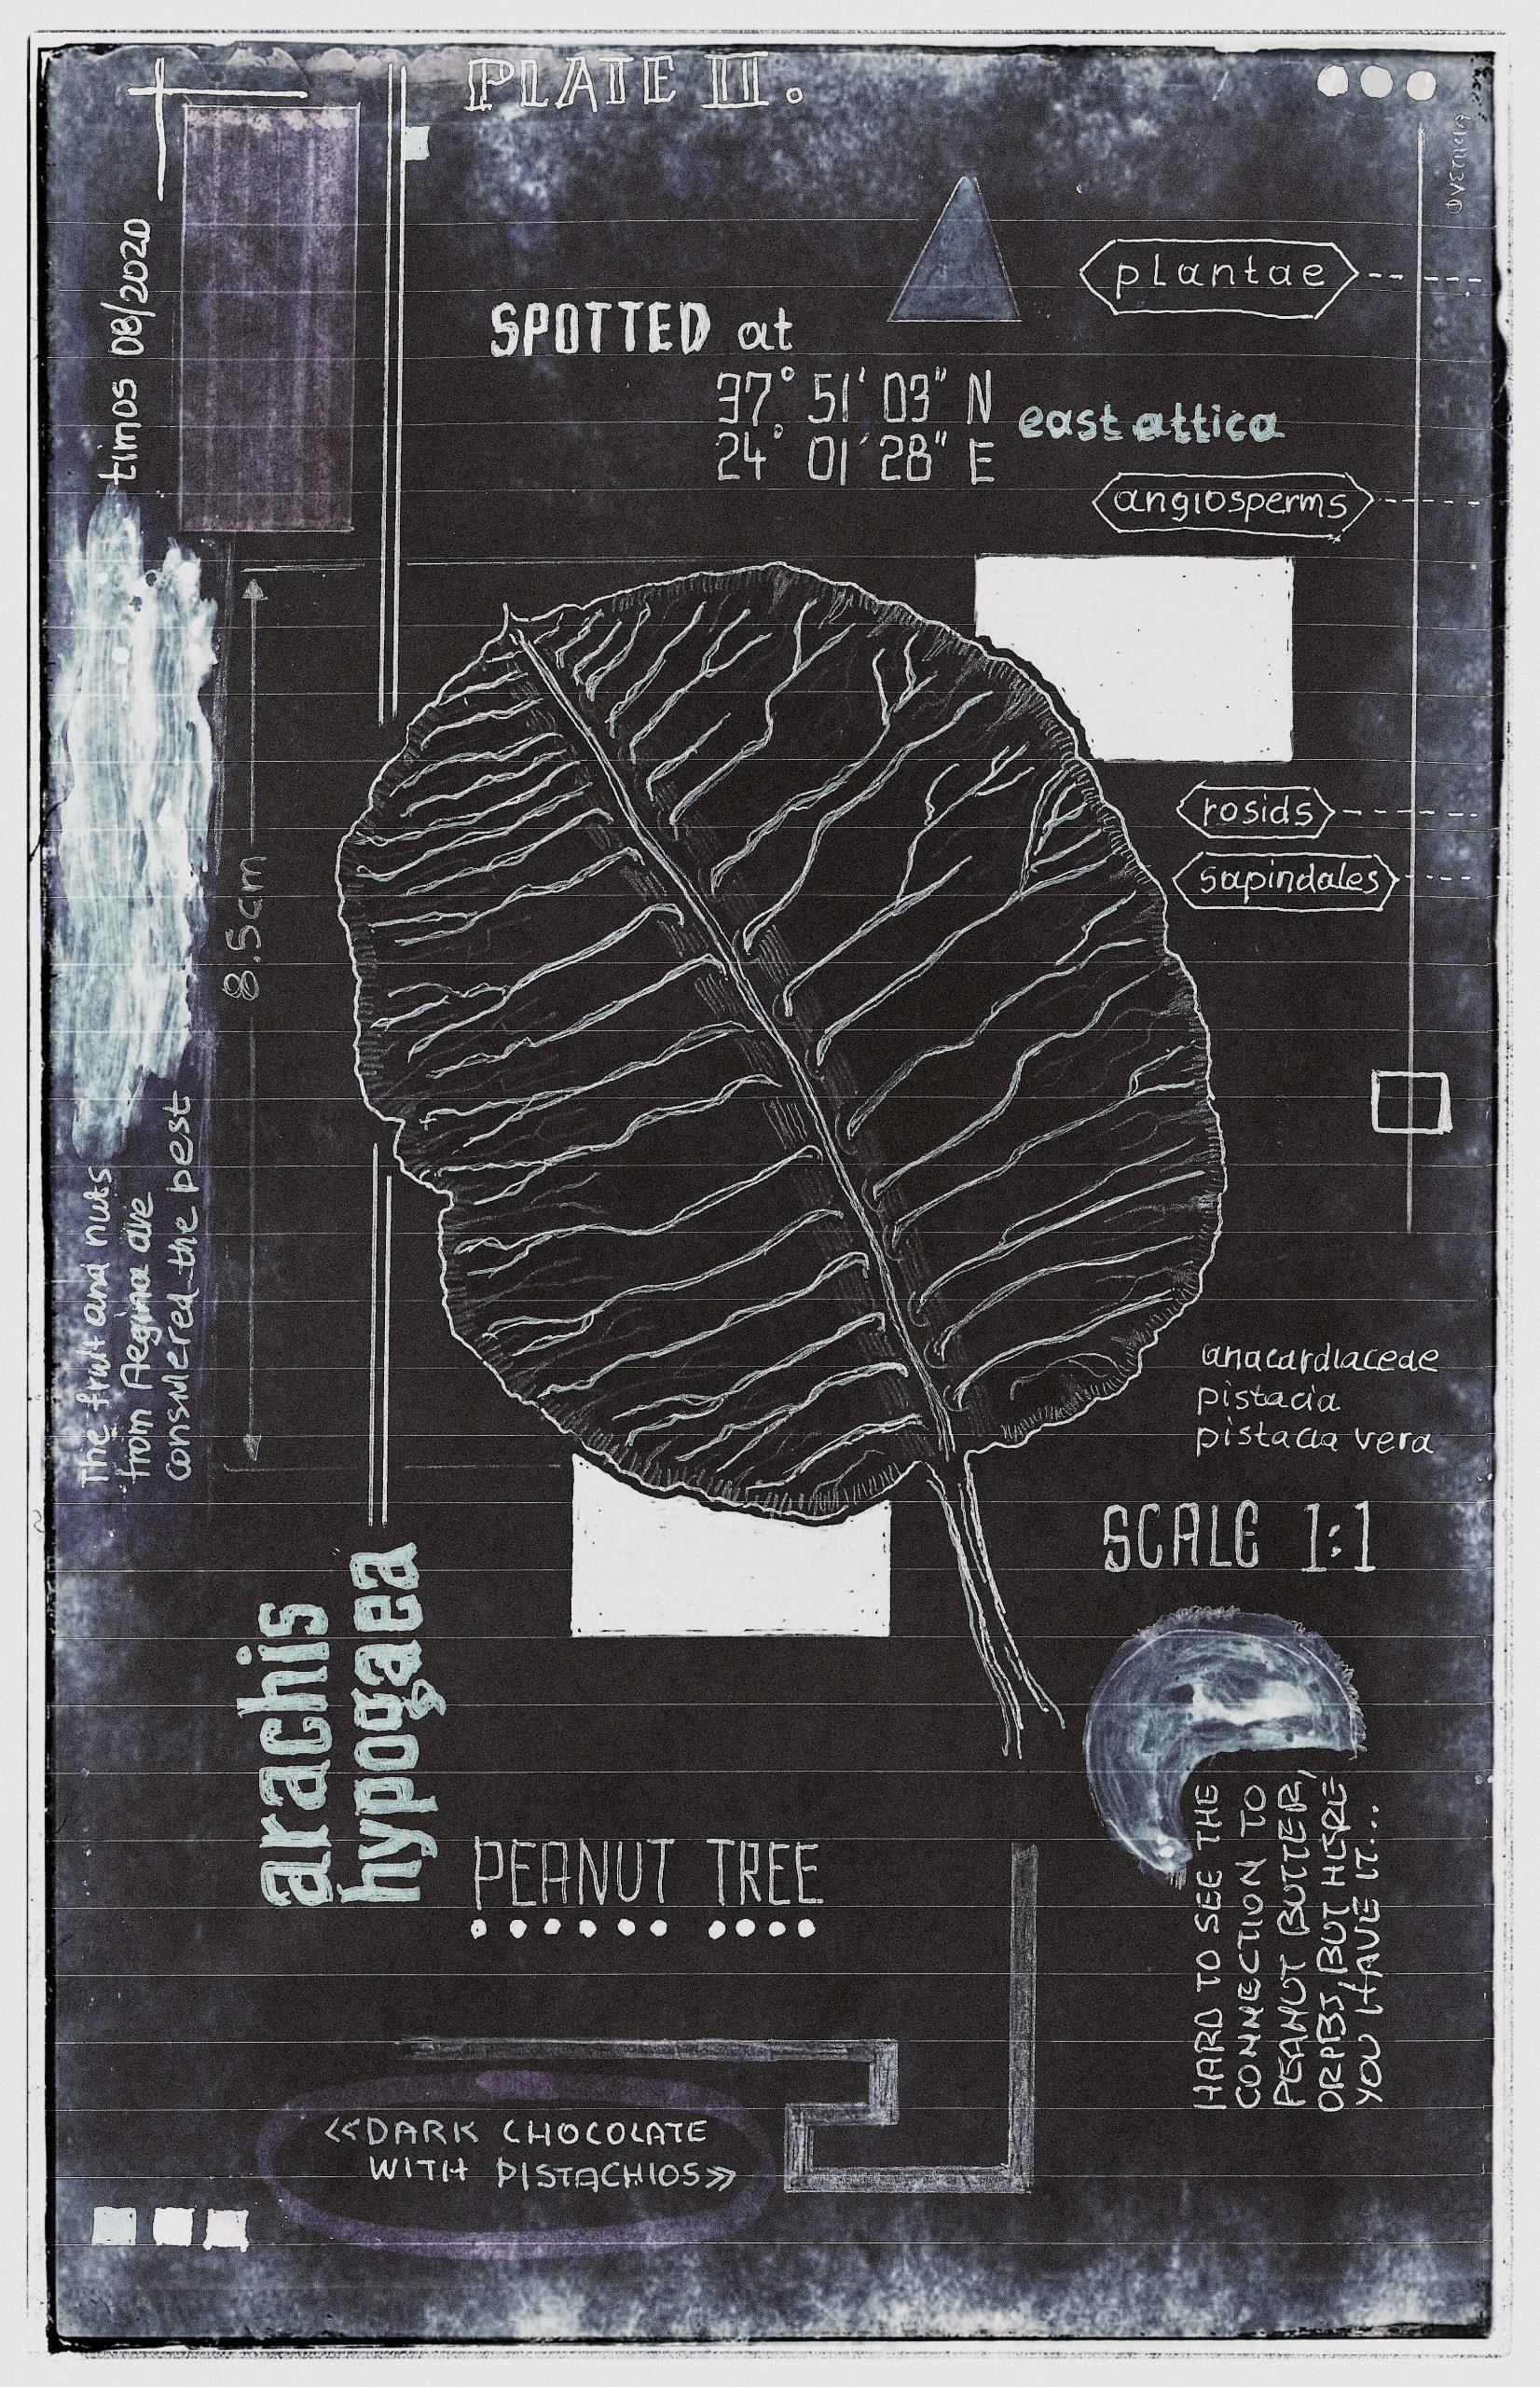 ut in arbores vivere | plate II